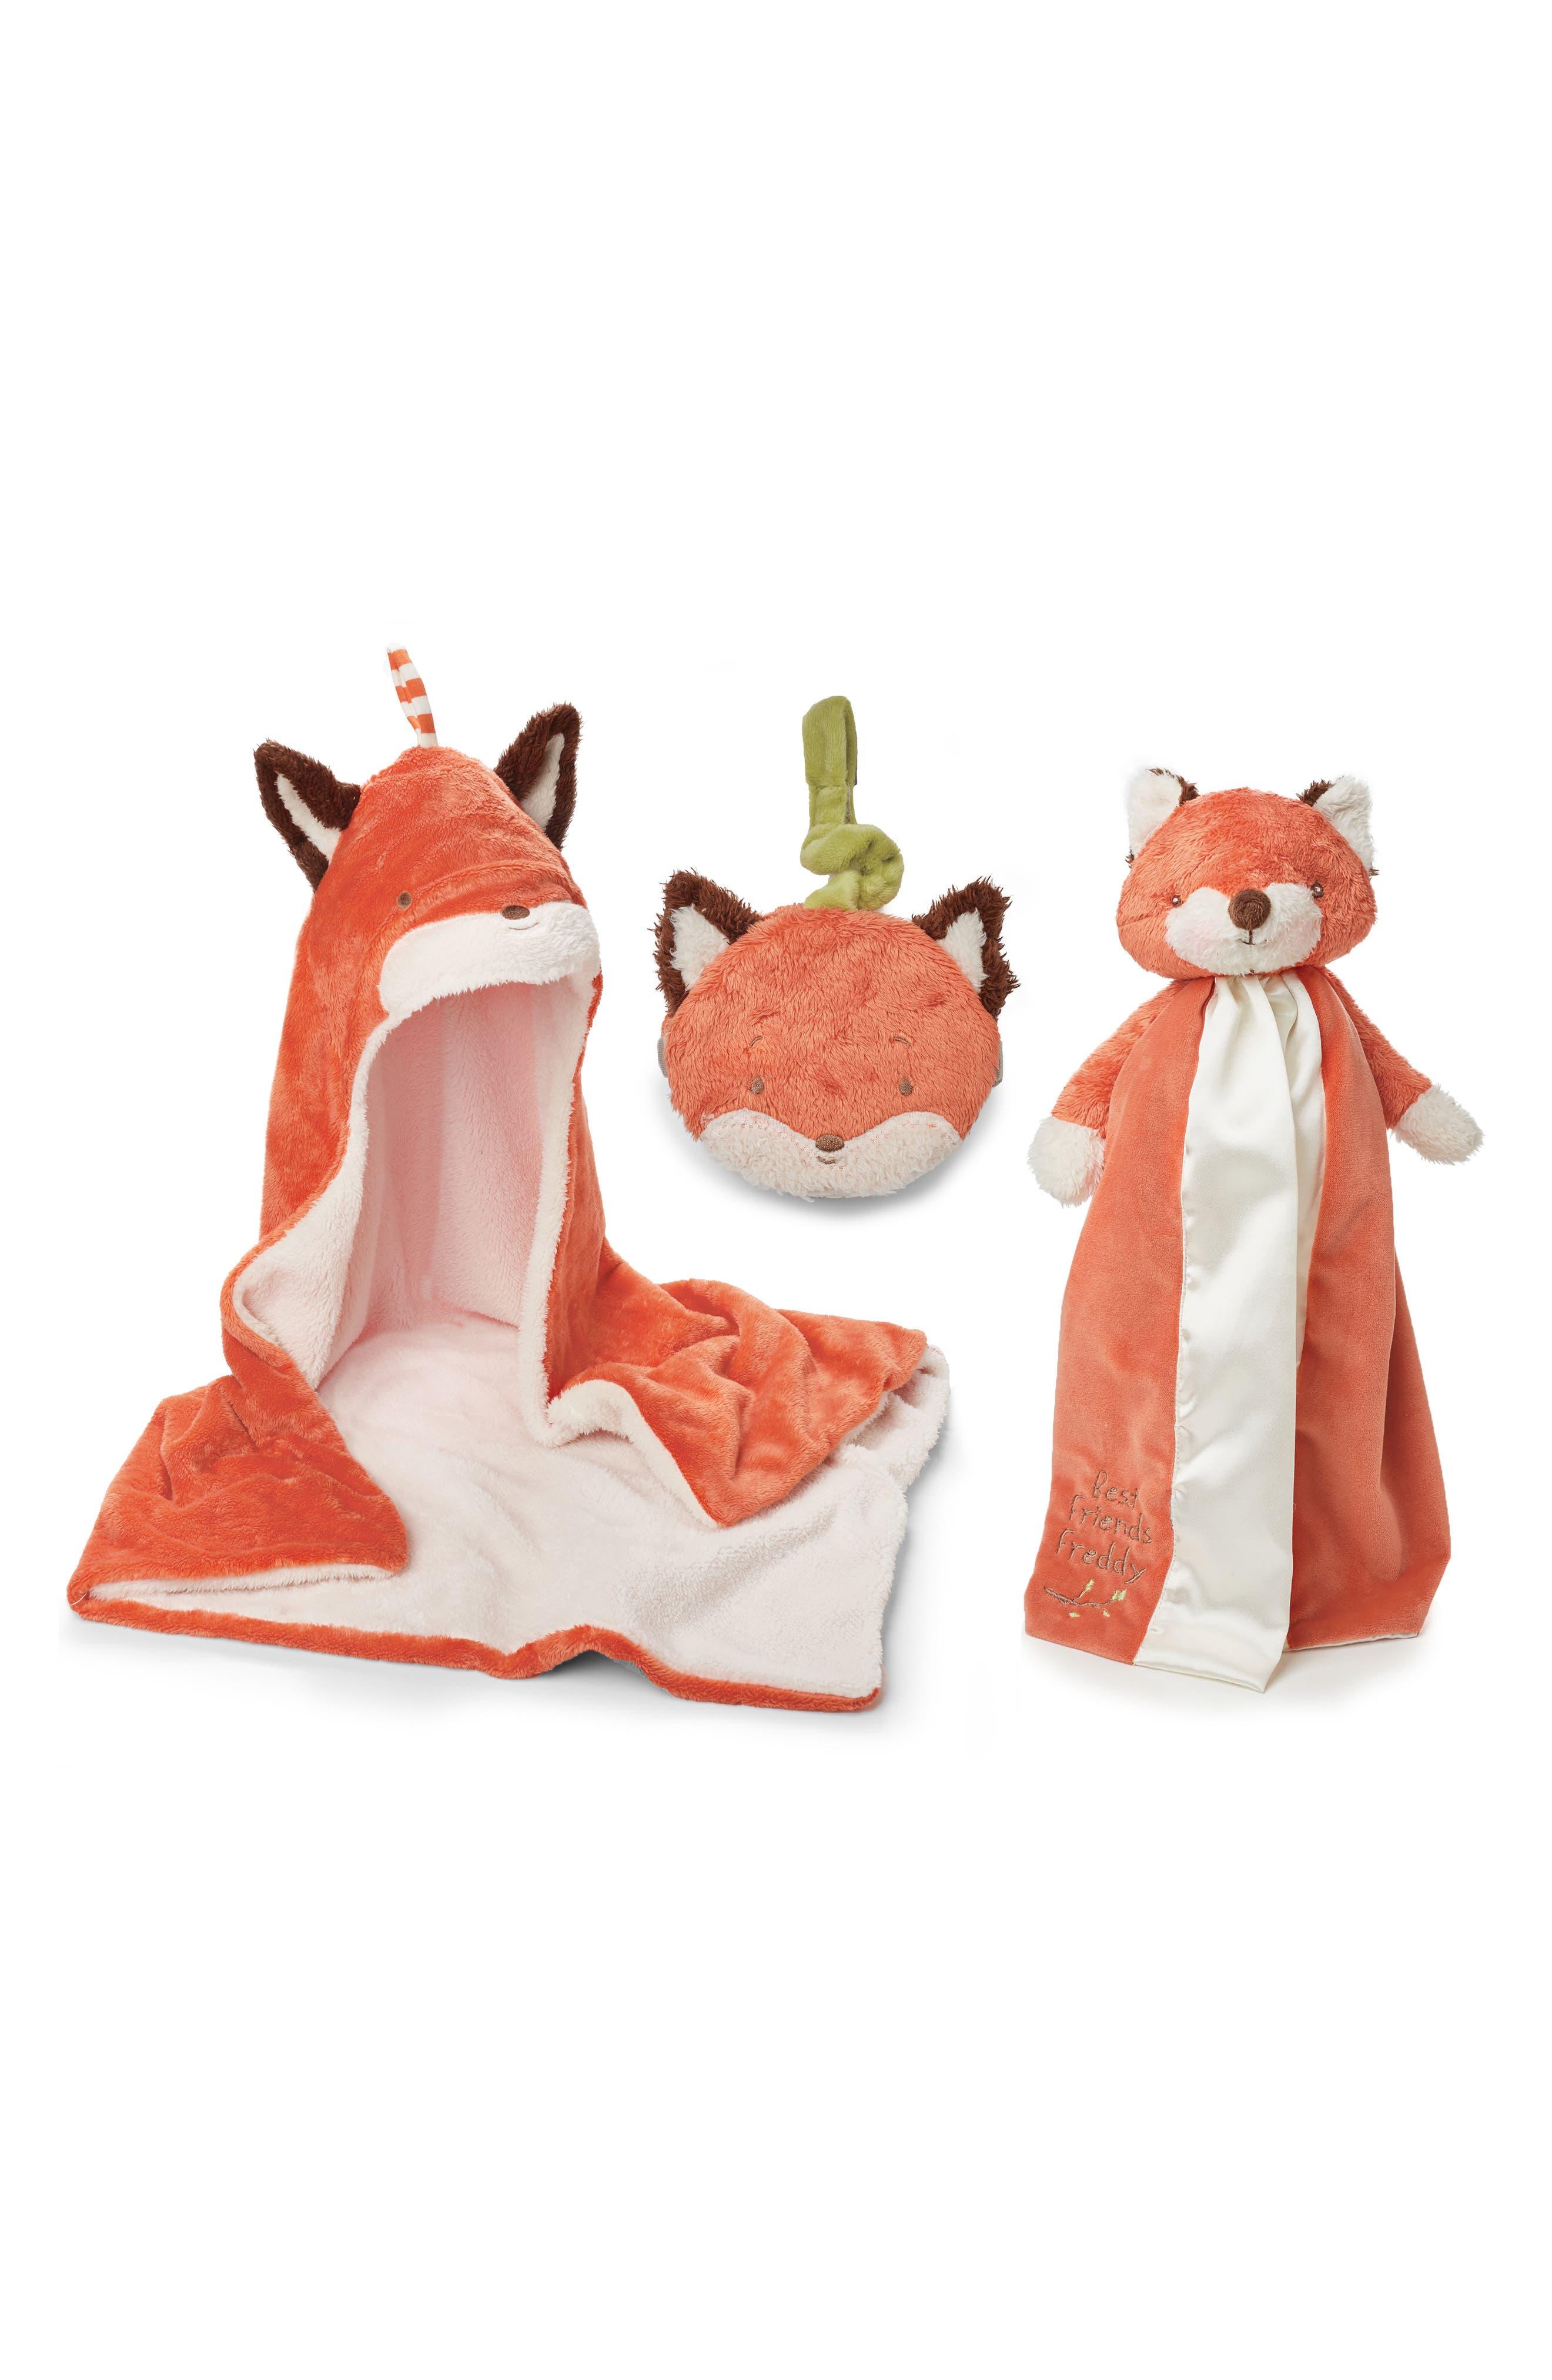 Main Image - Bunnies by the Bay Fox Blanket, Book & Lovie Set